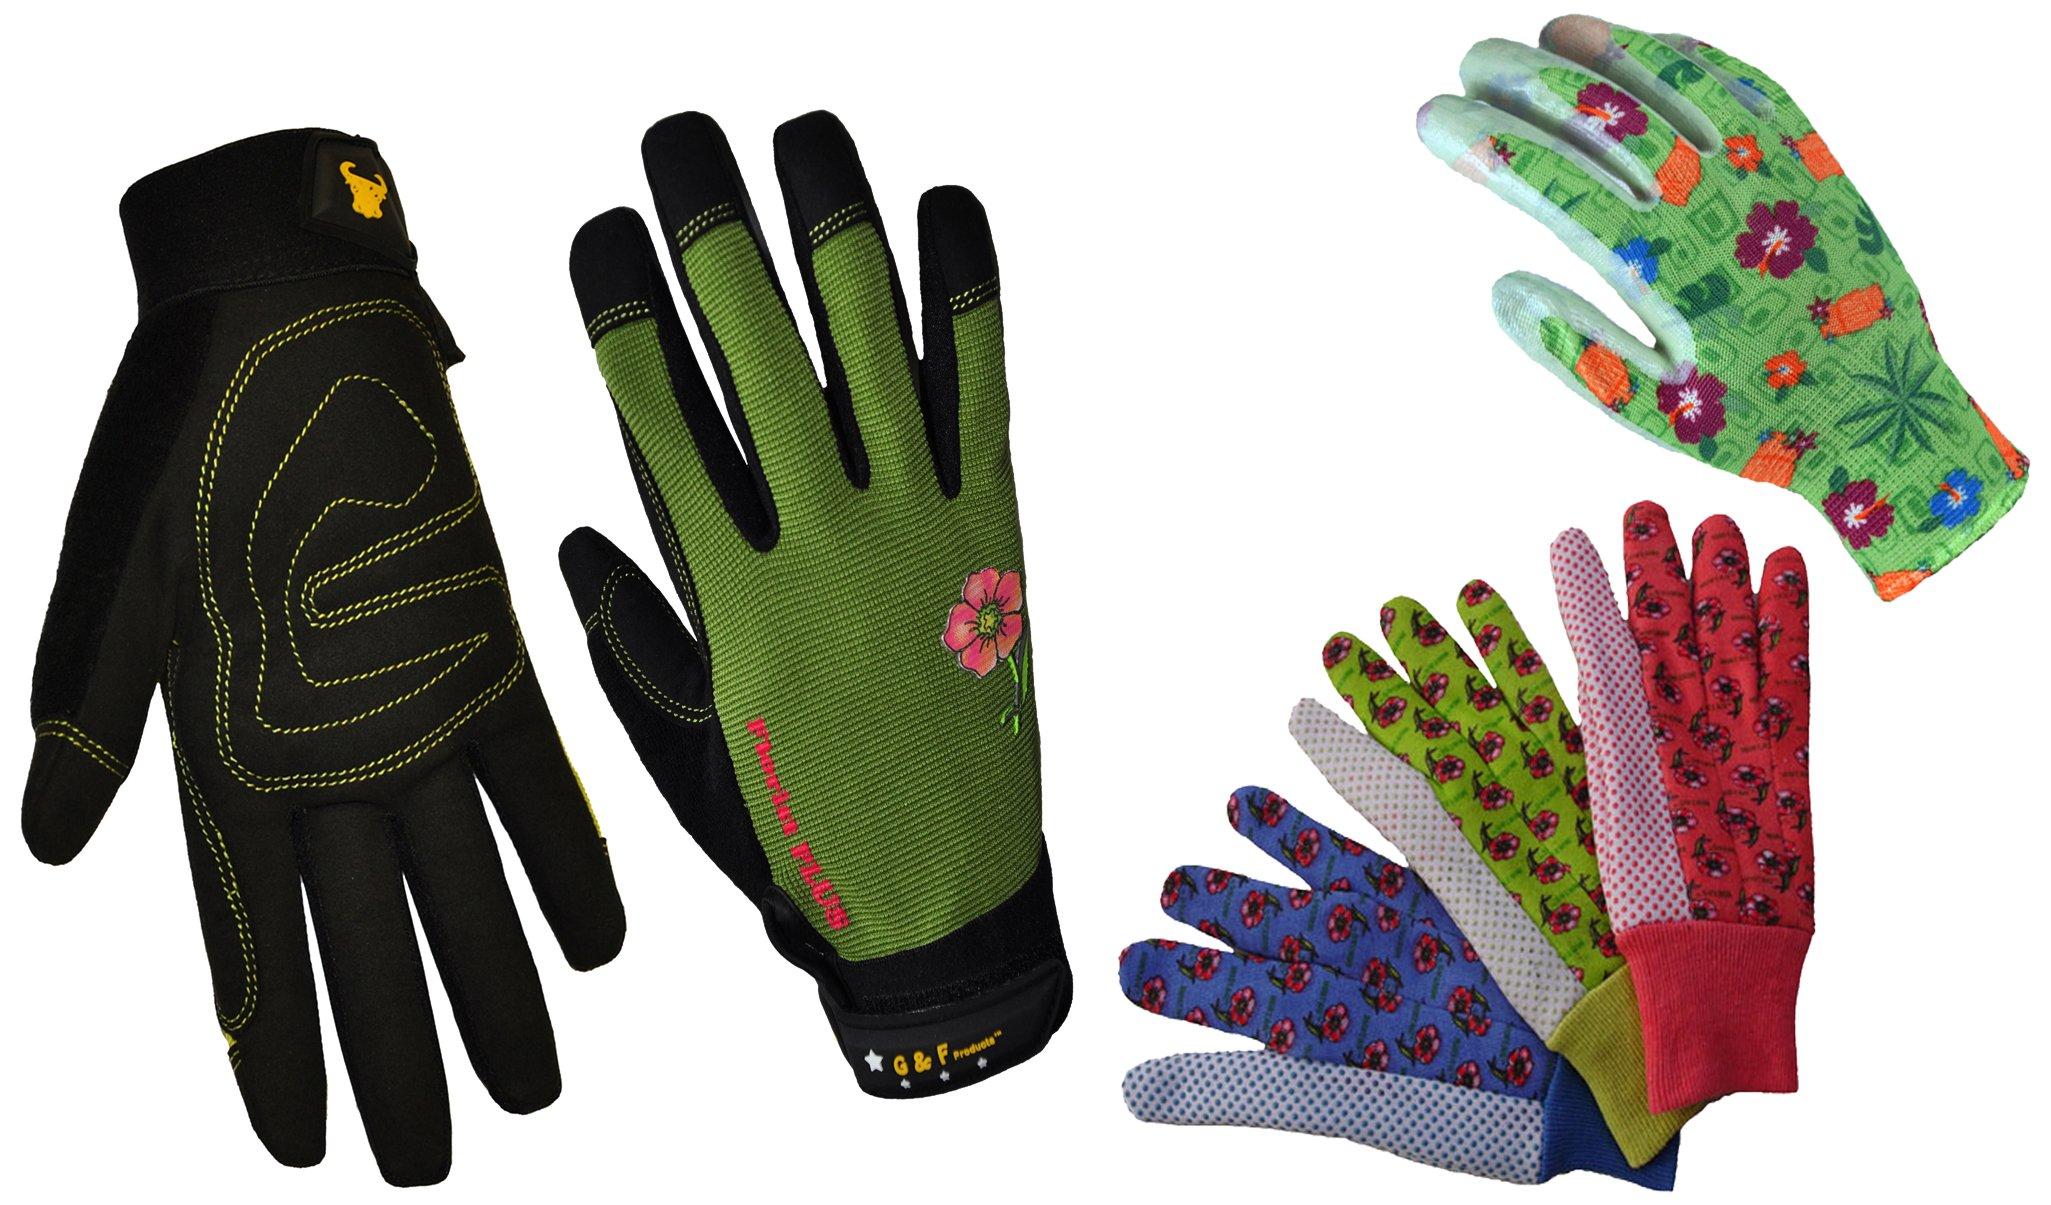 G & F 1093-1519-18523L Garden gloves assortment, 3 styles, Women's, Large, 5 pairs